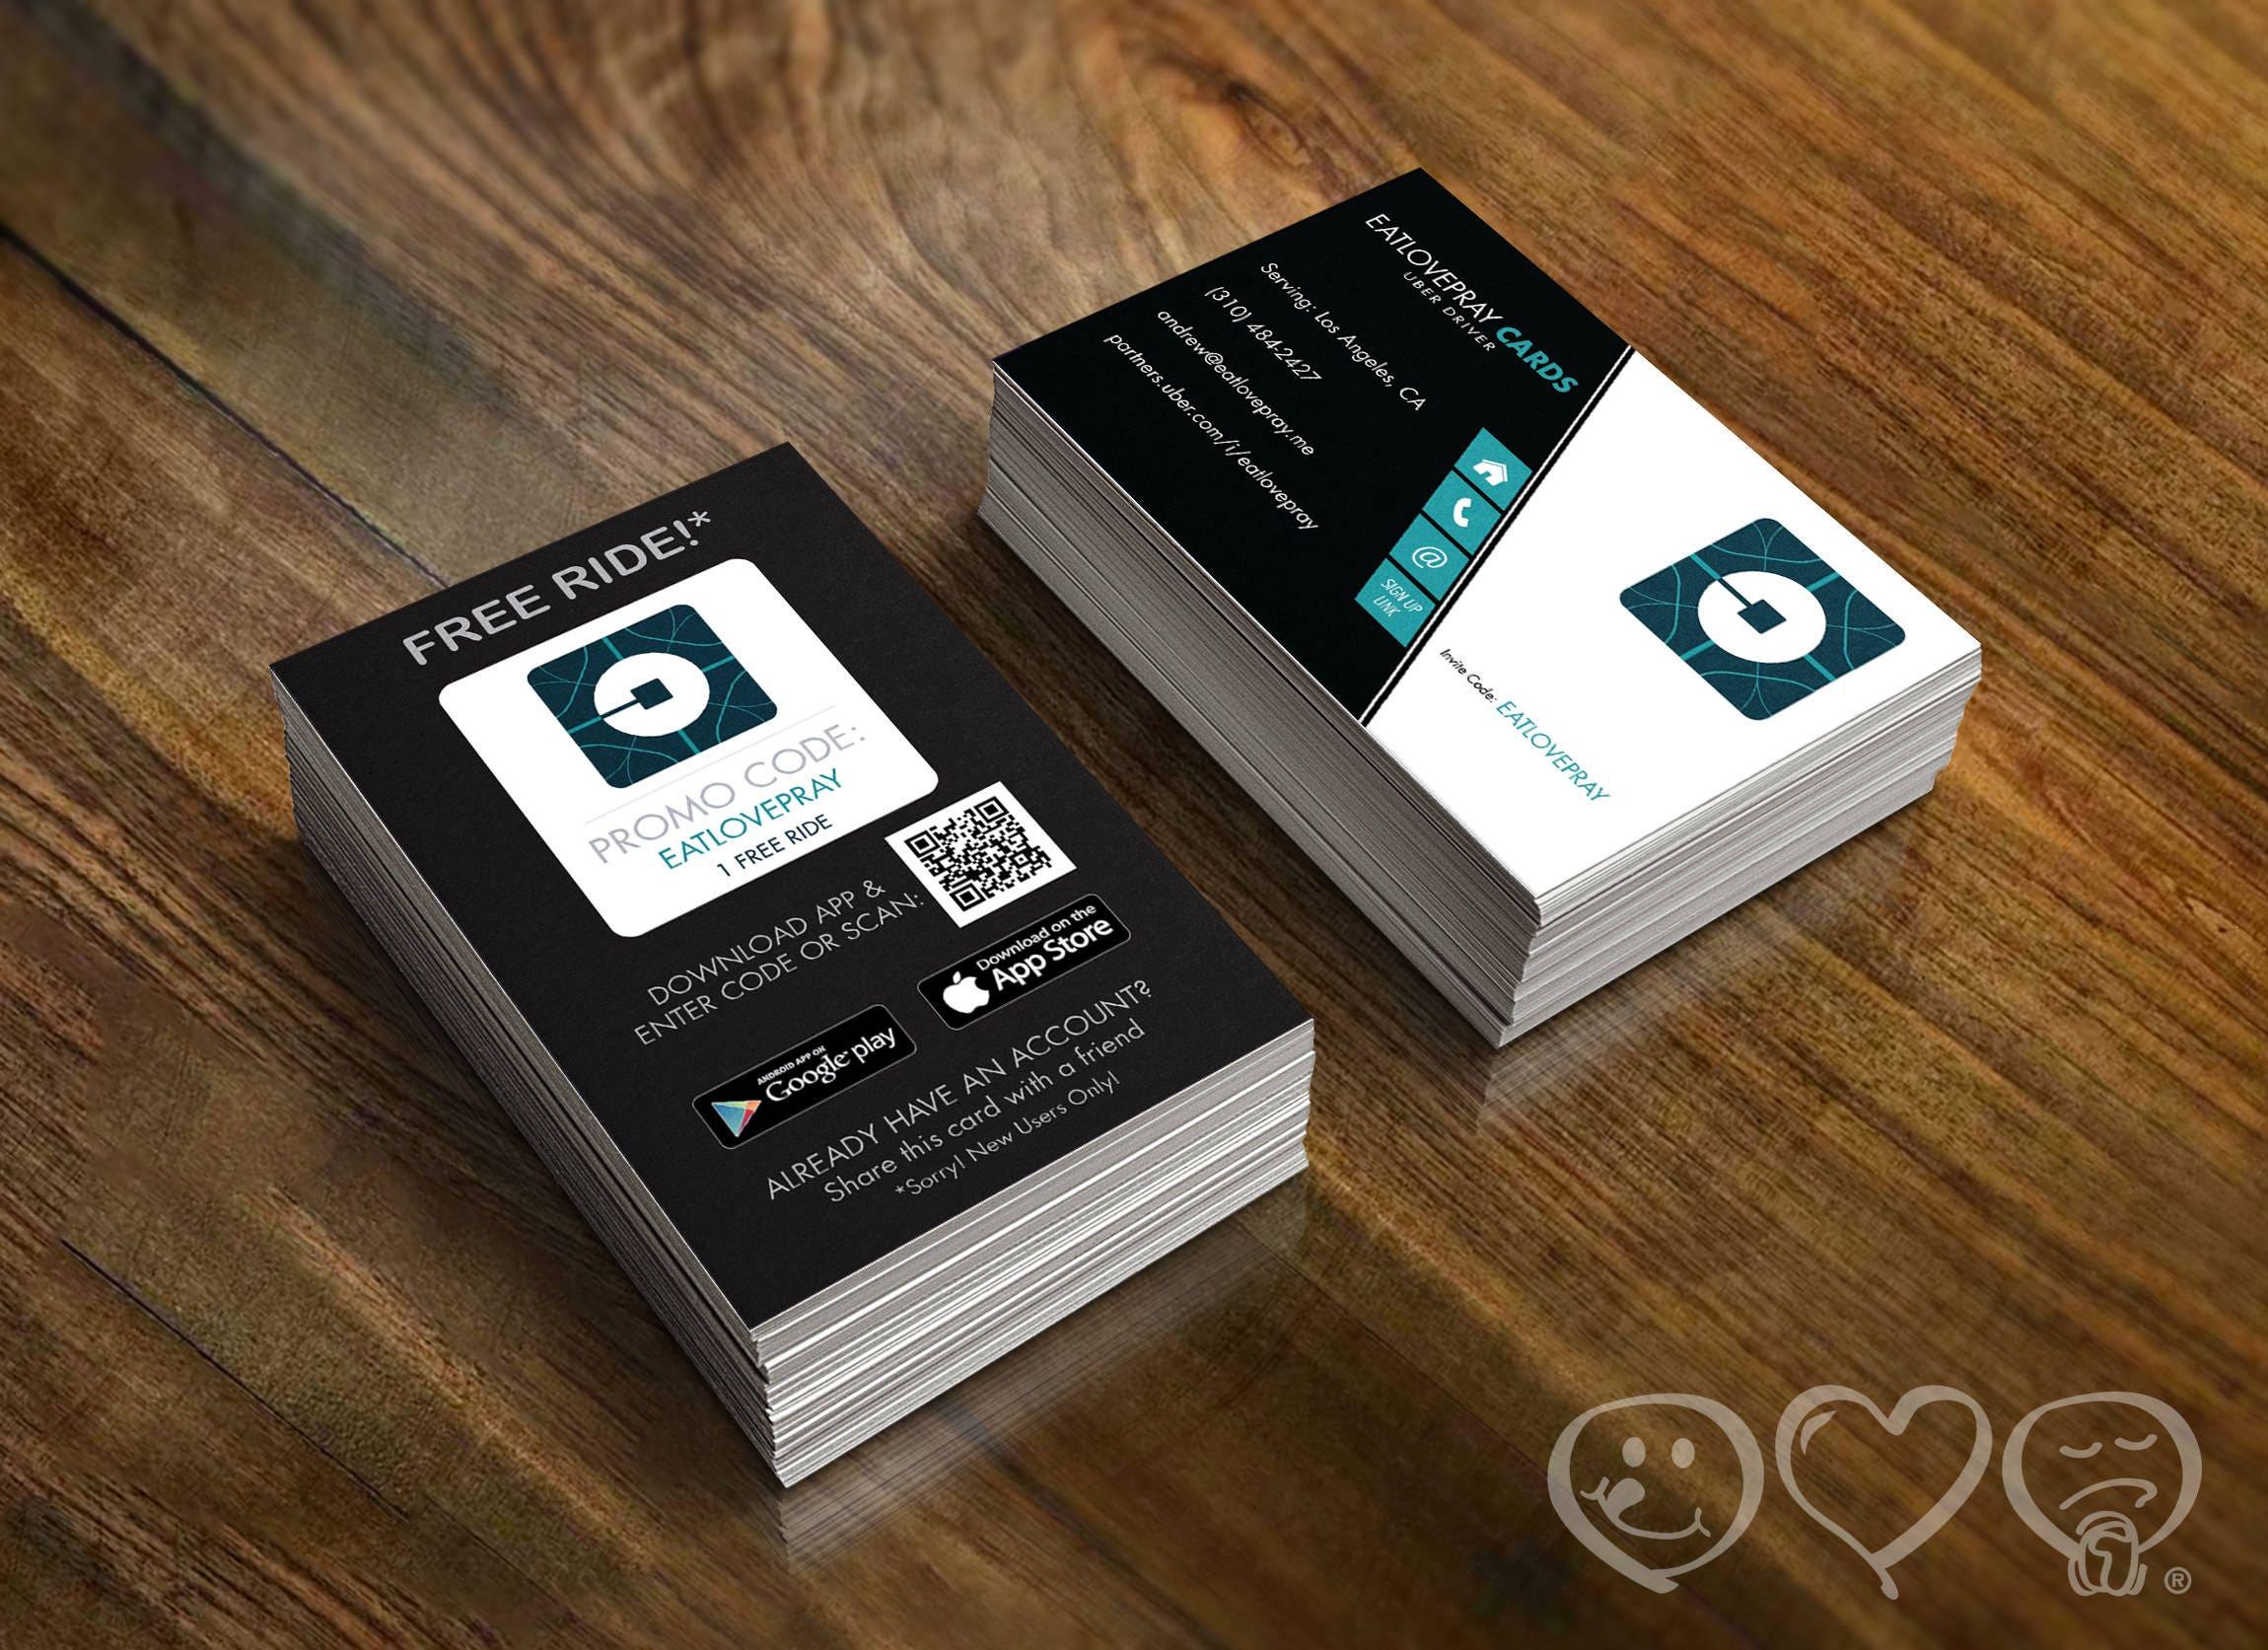 Uber Business Cards with Free Uber Promo on back side 16pt